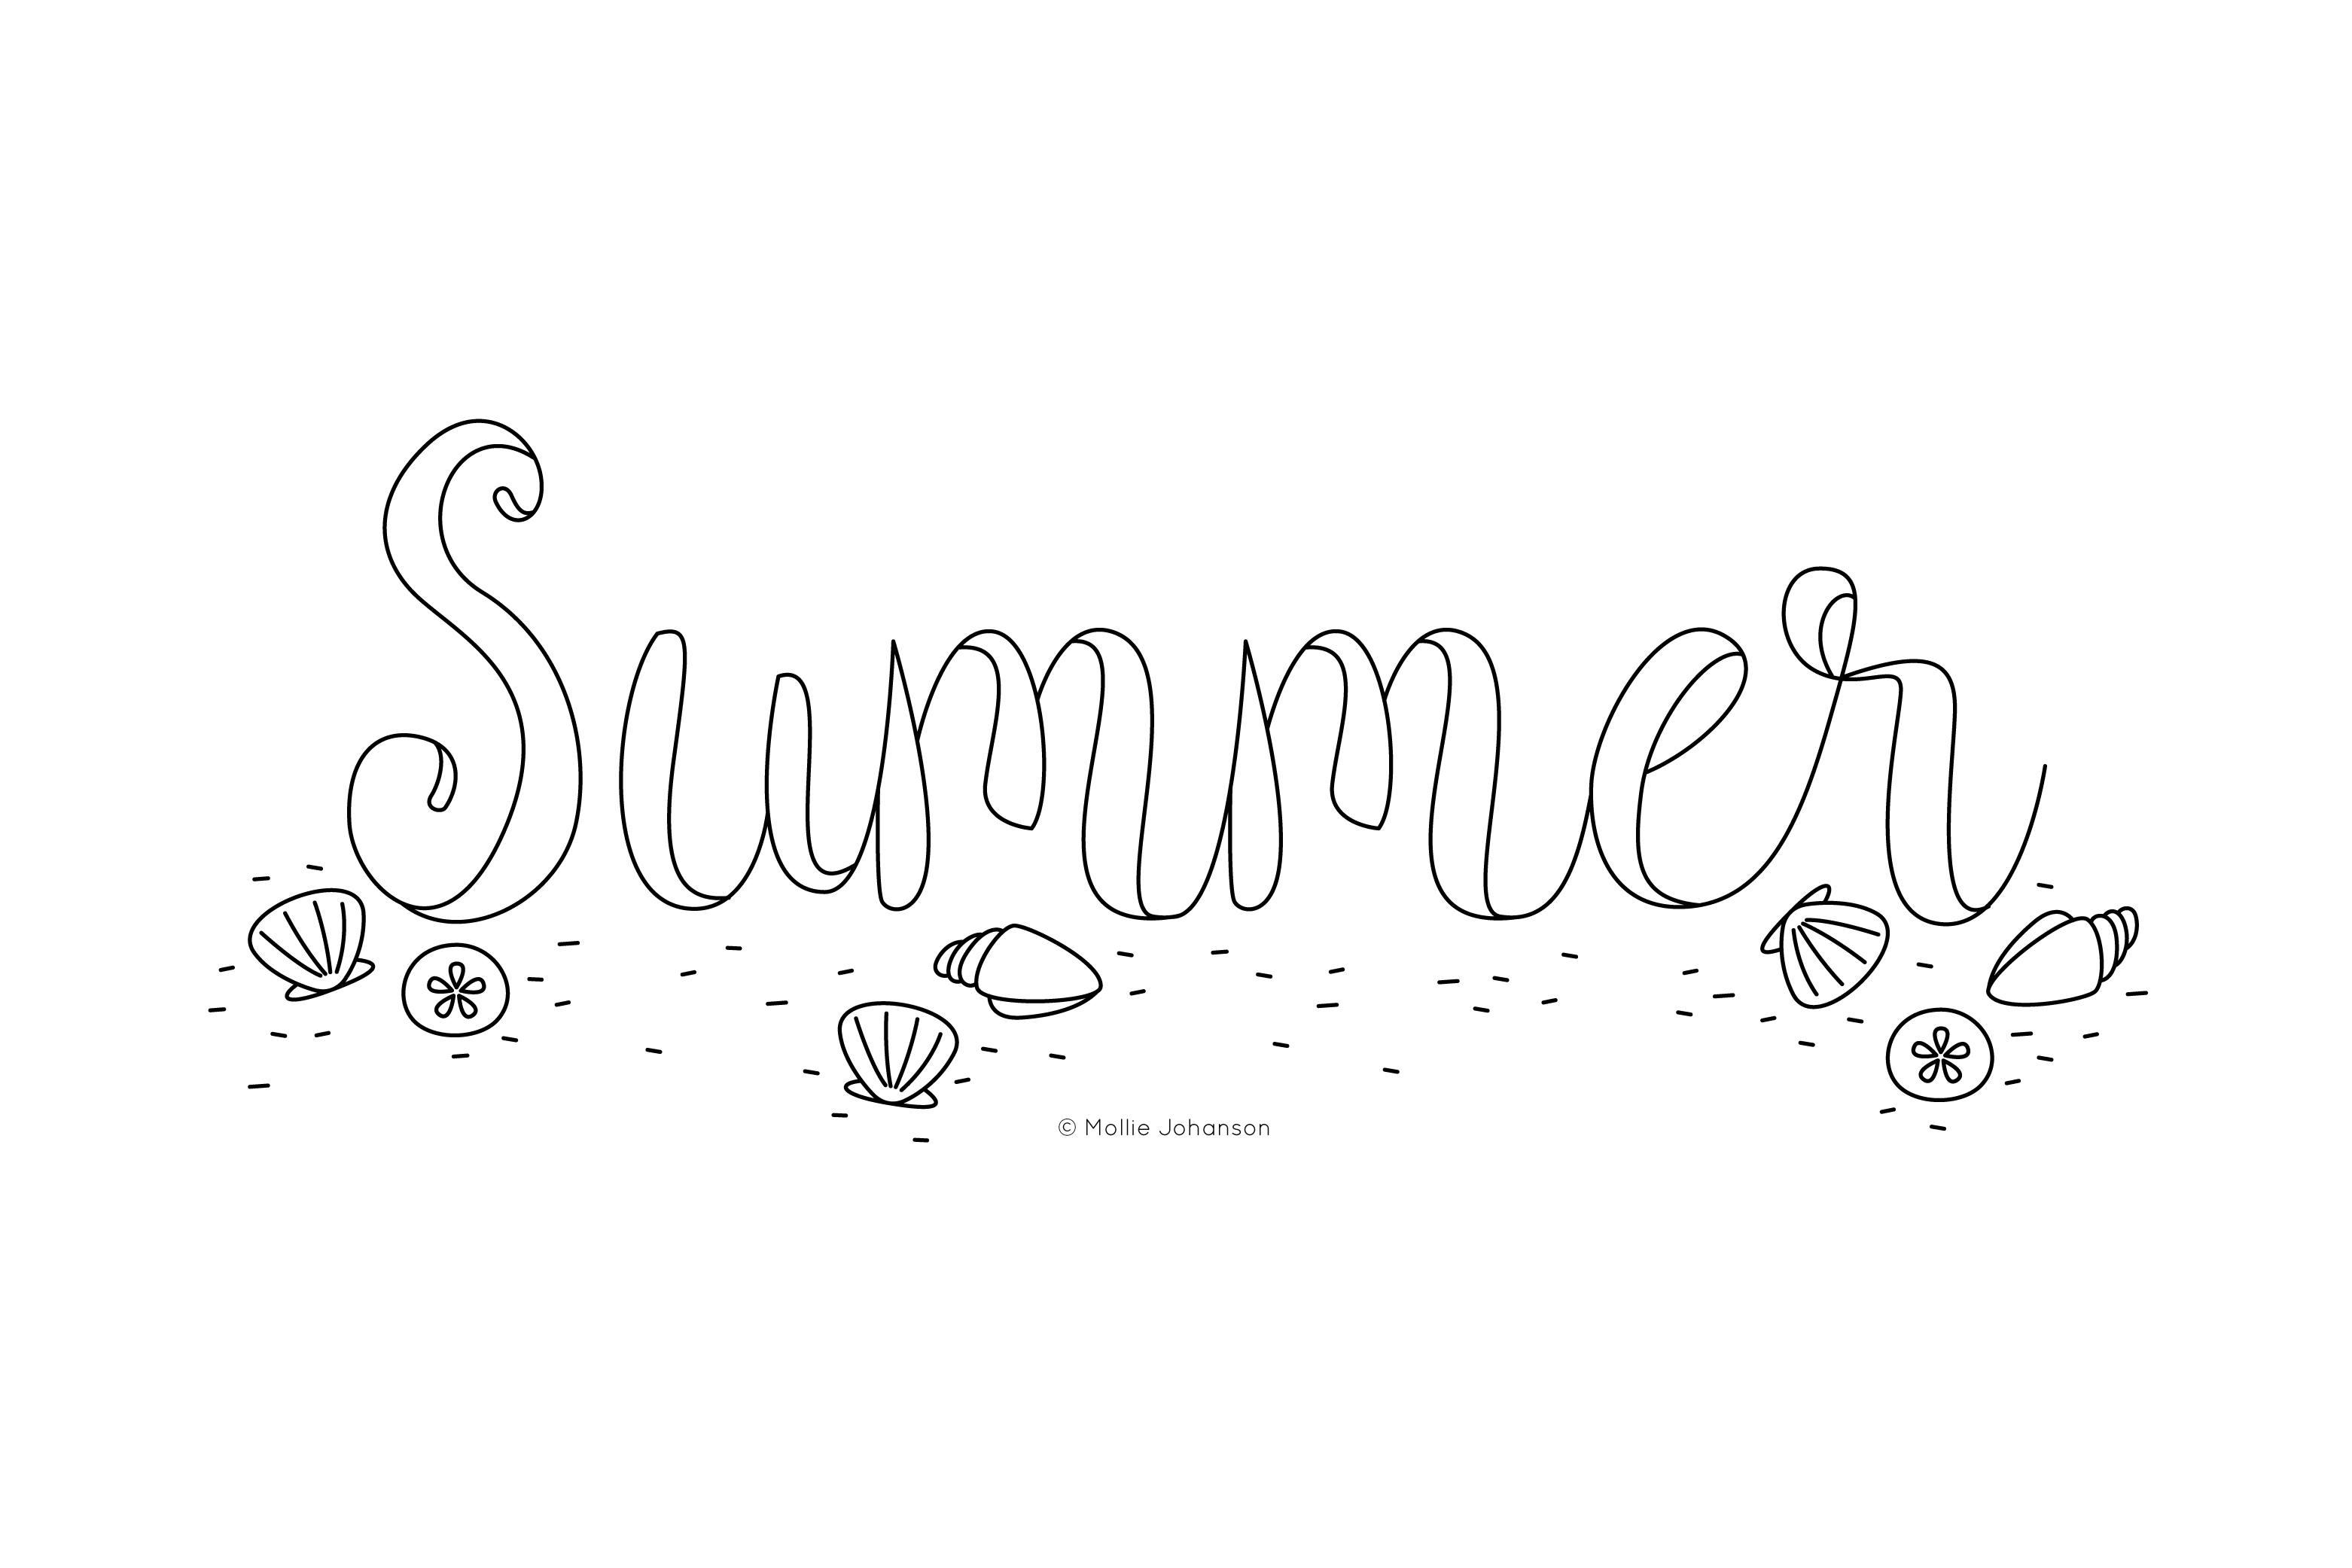 Summer 58f7bc575f9b581d597d3177